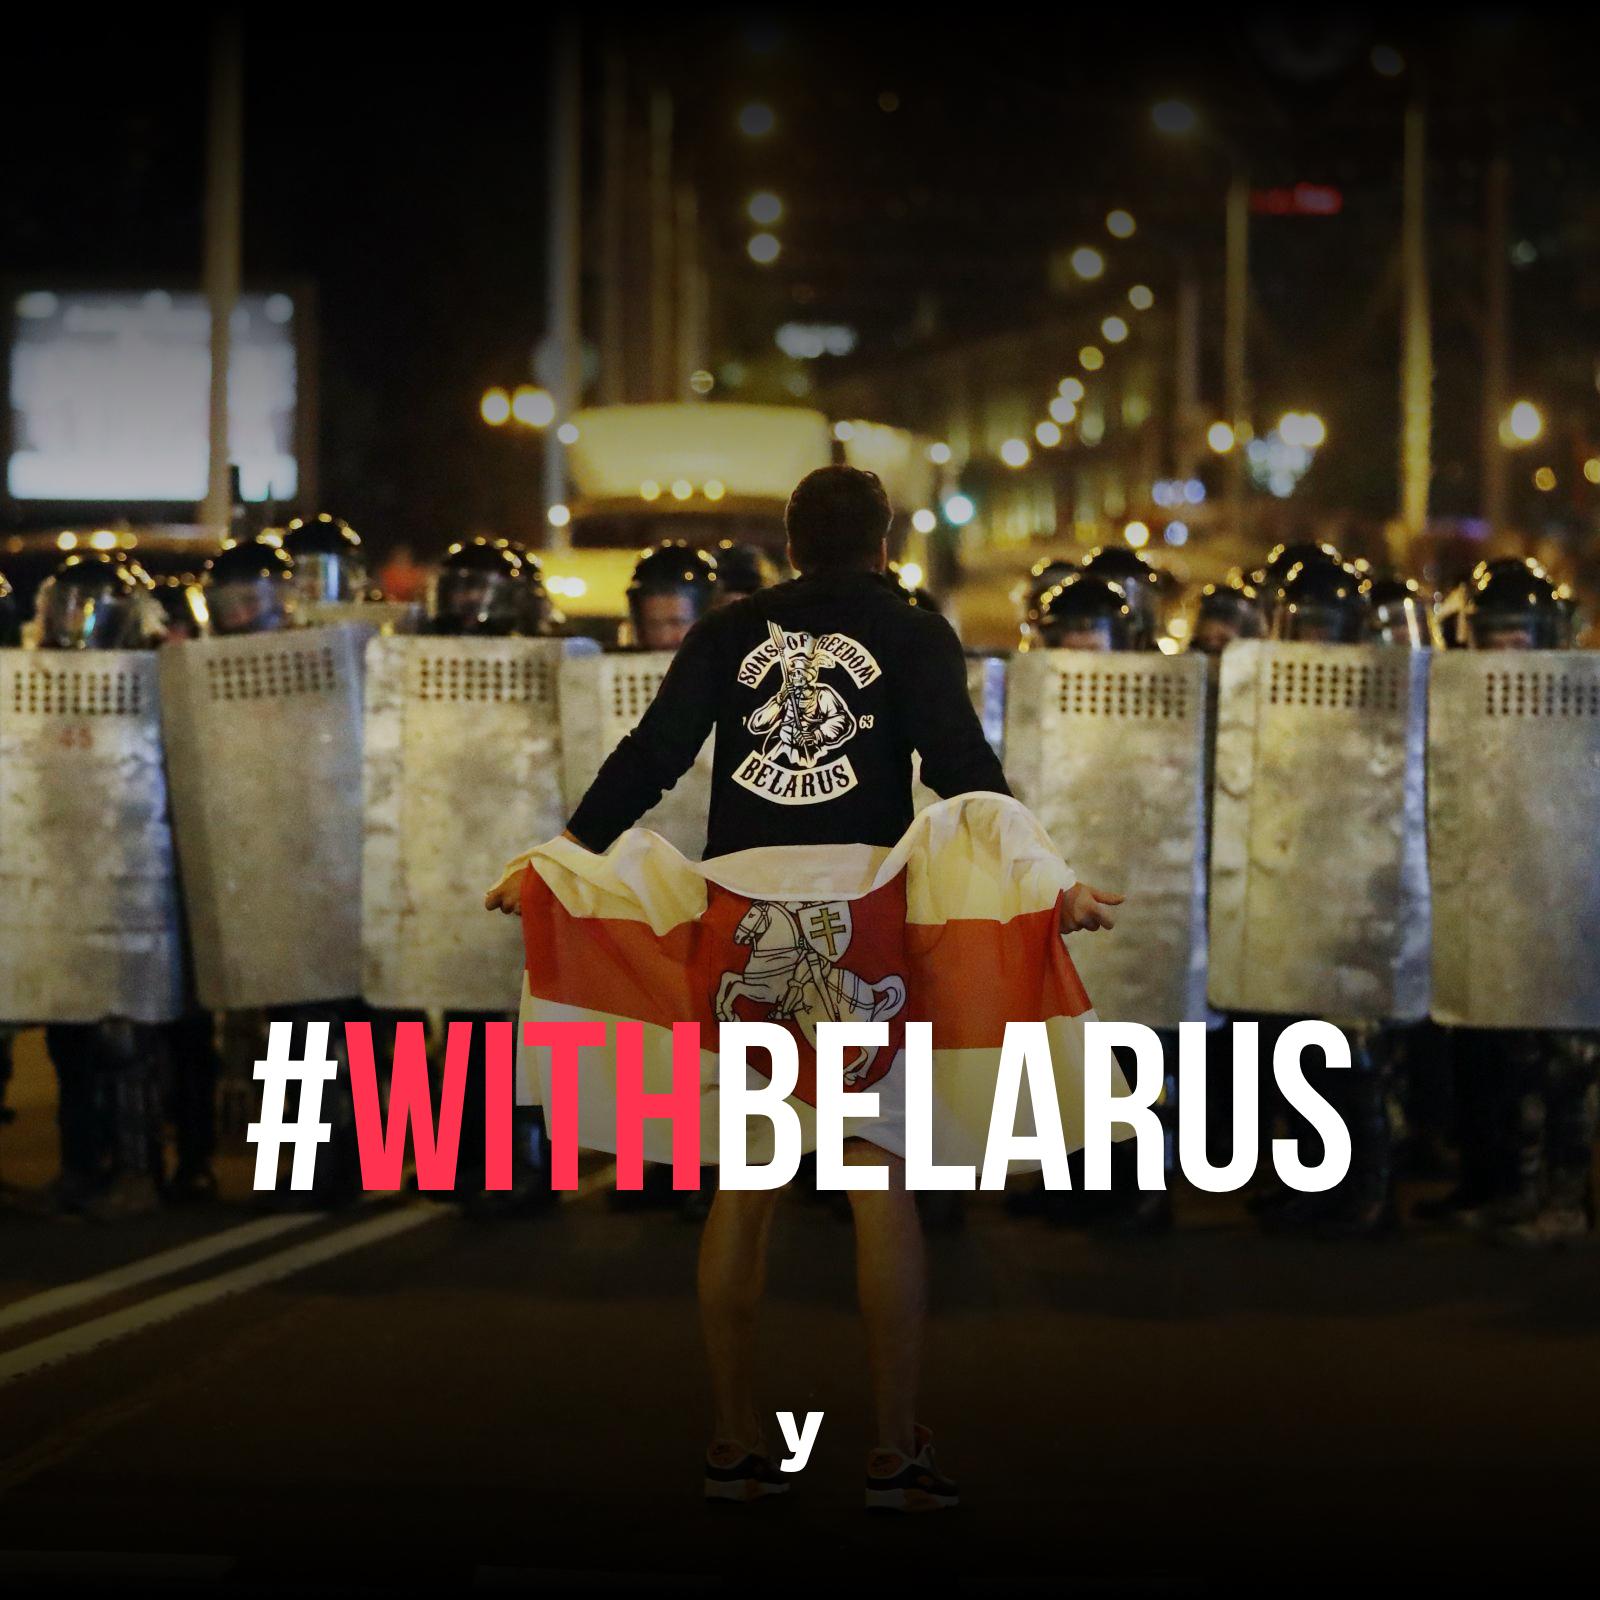 belarus protests copy 2